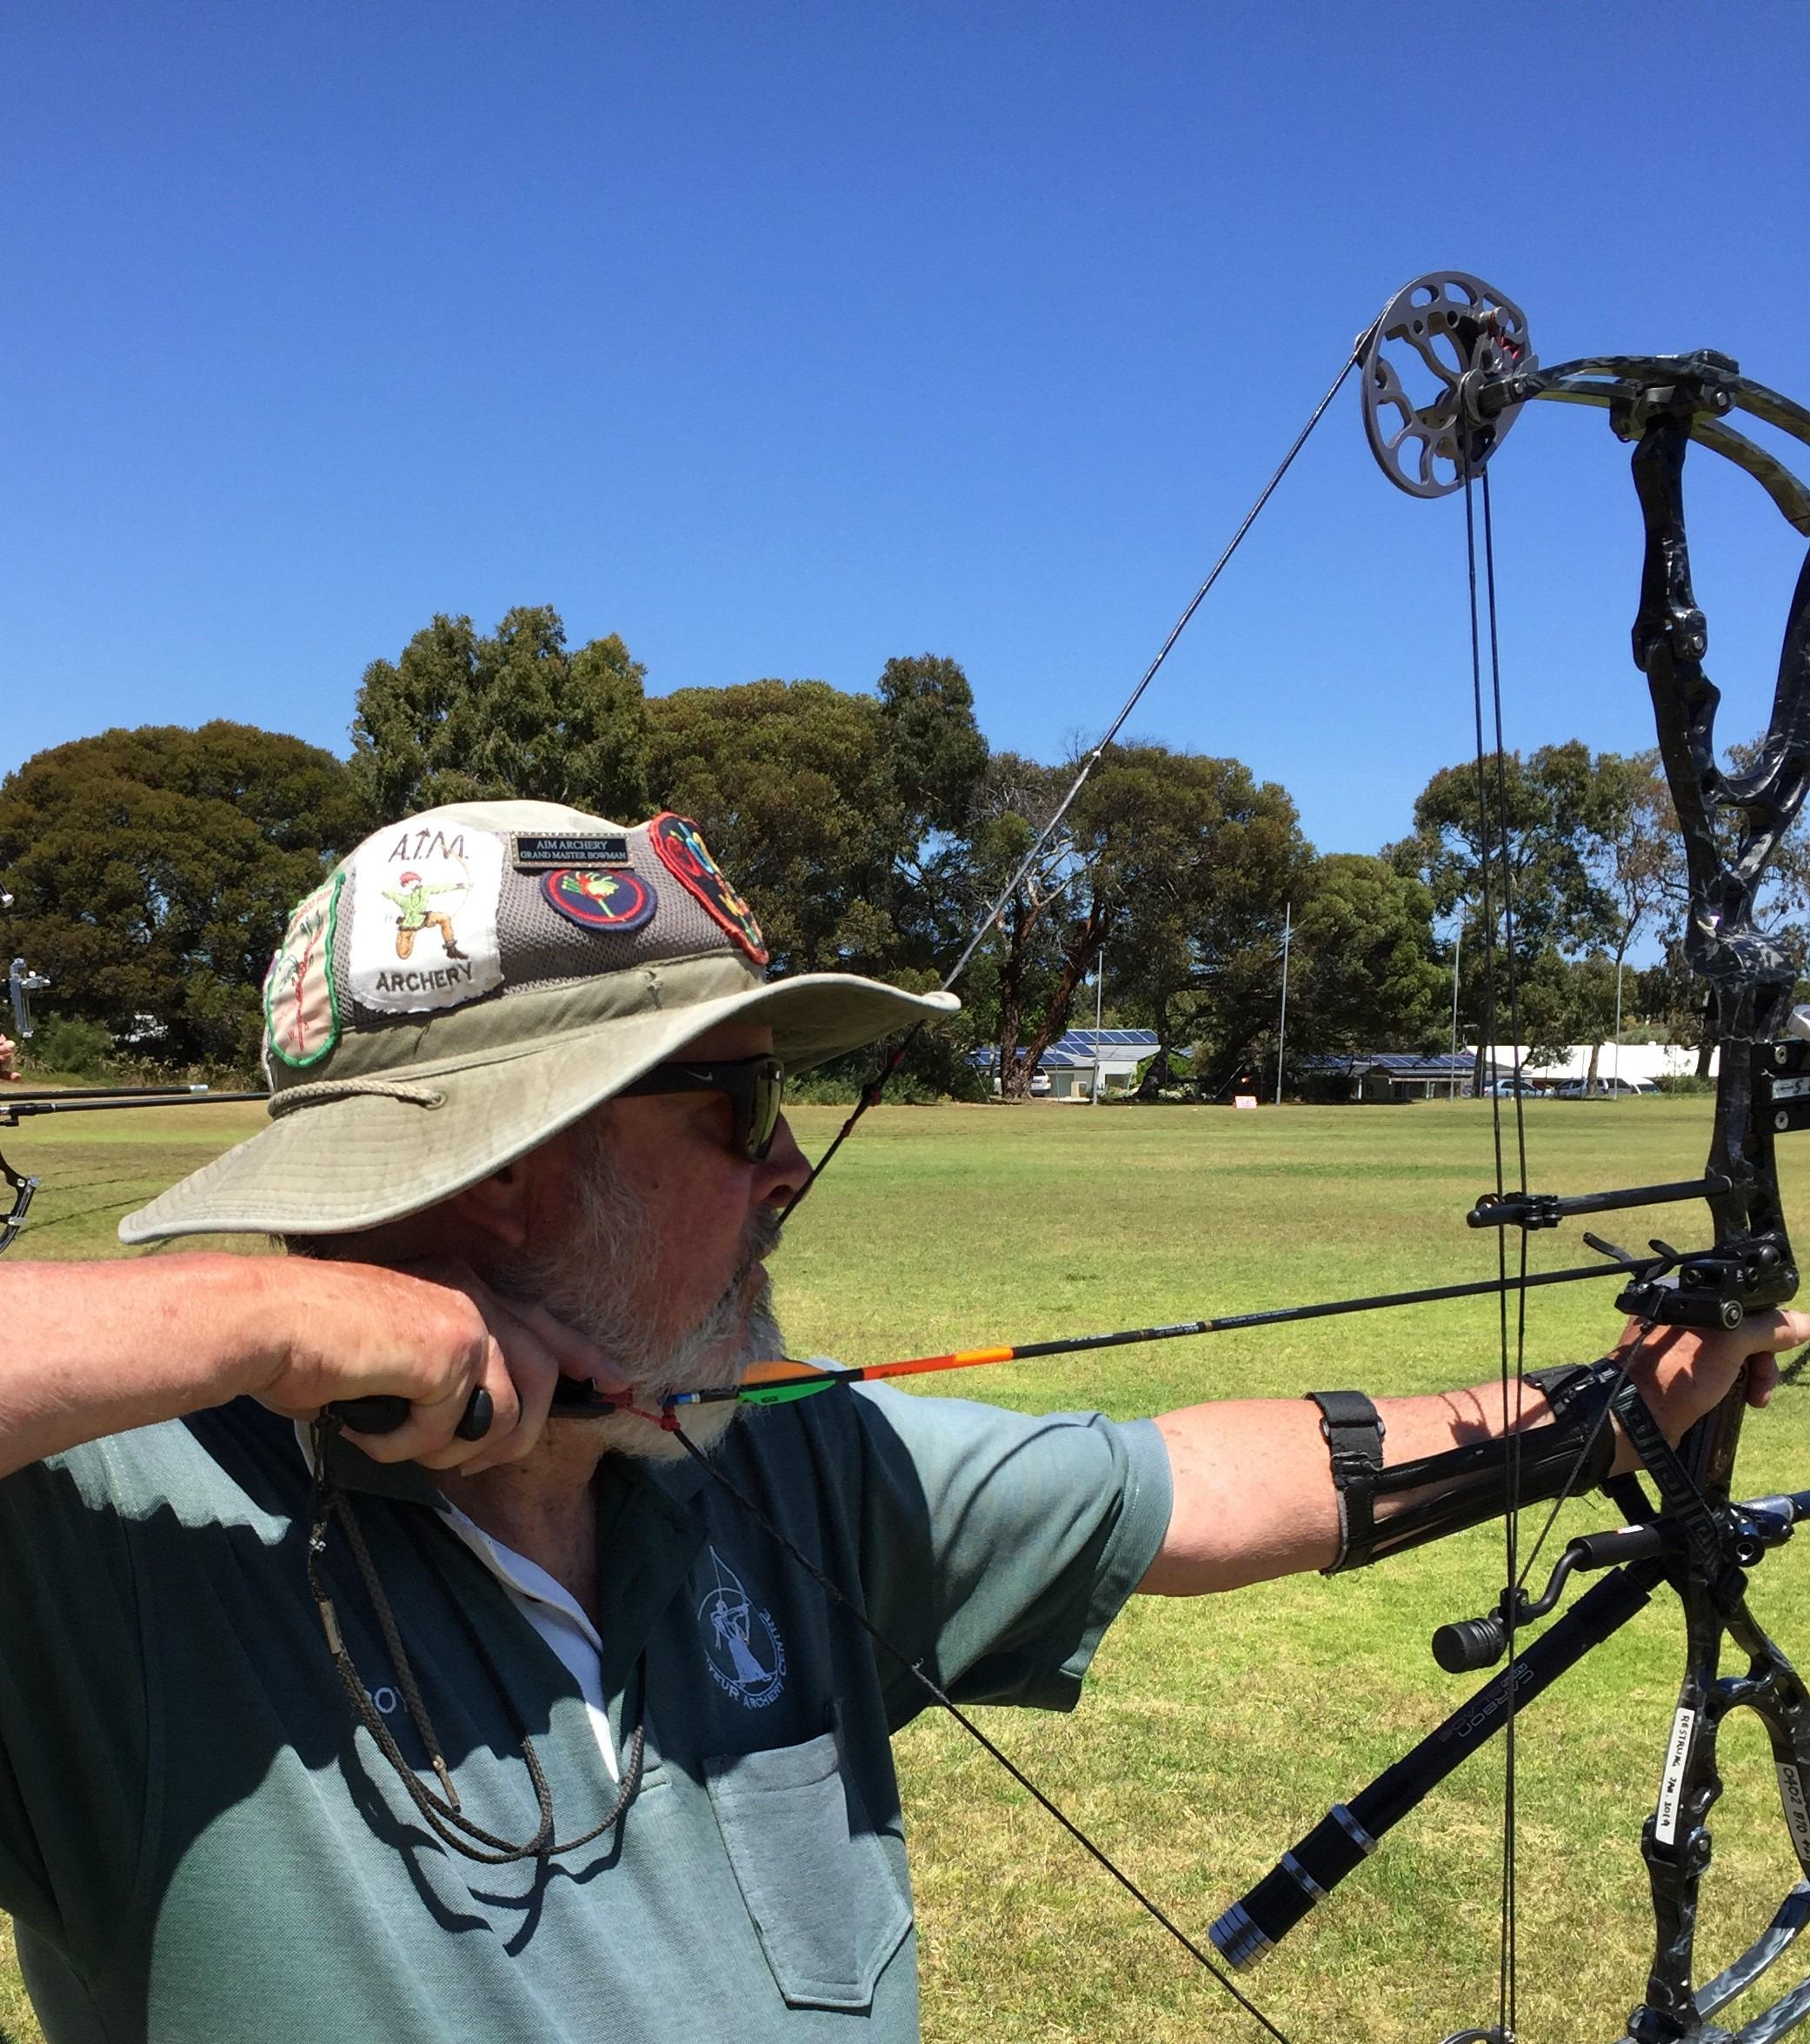 Compound archer